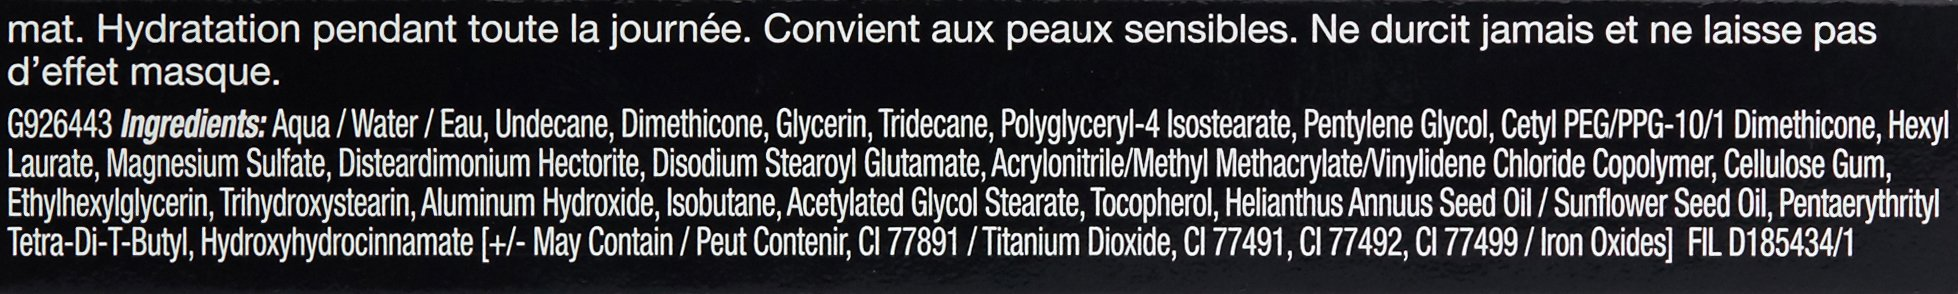 Dermablend Smooth Liquid Concealer, Fair, 0.2 Fl. Oz. by Dermablend (Image #5)